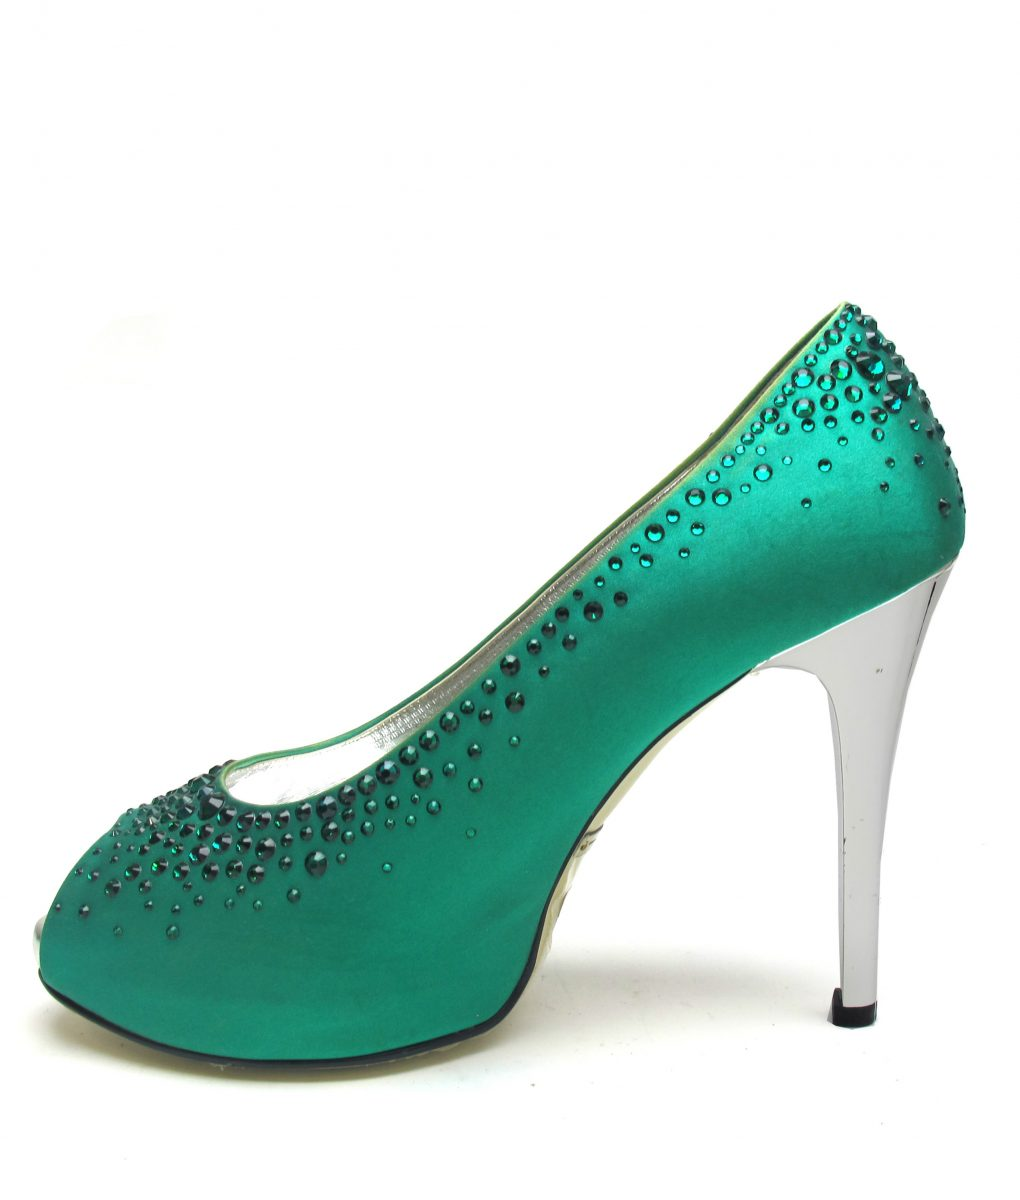 Suecomma Bonnie Green & Swarovski Open toe heels